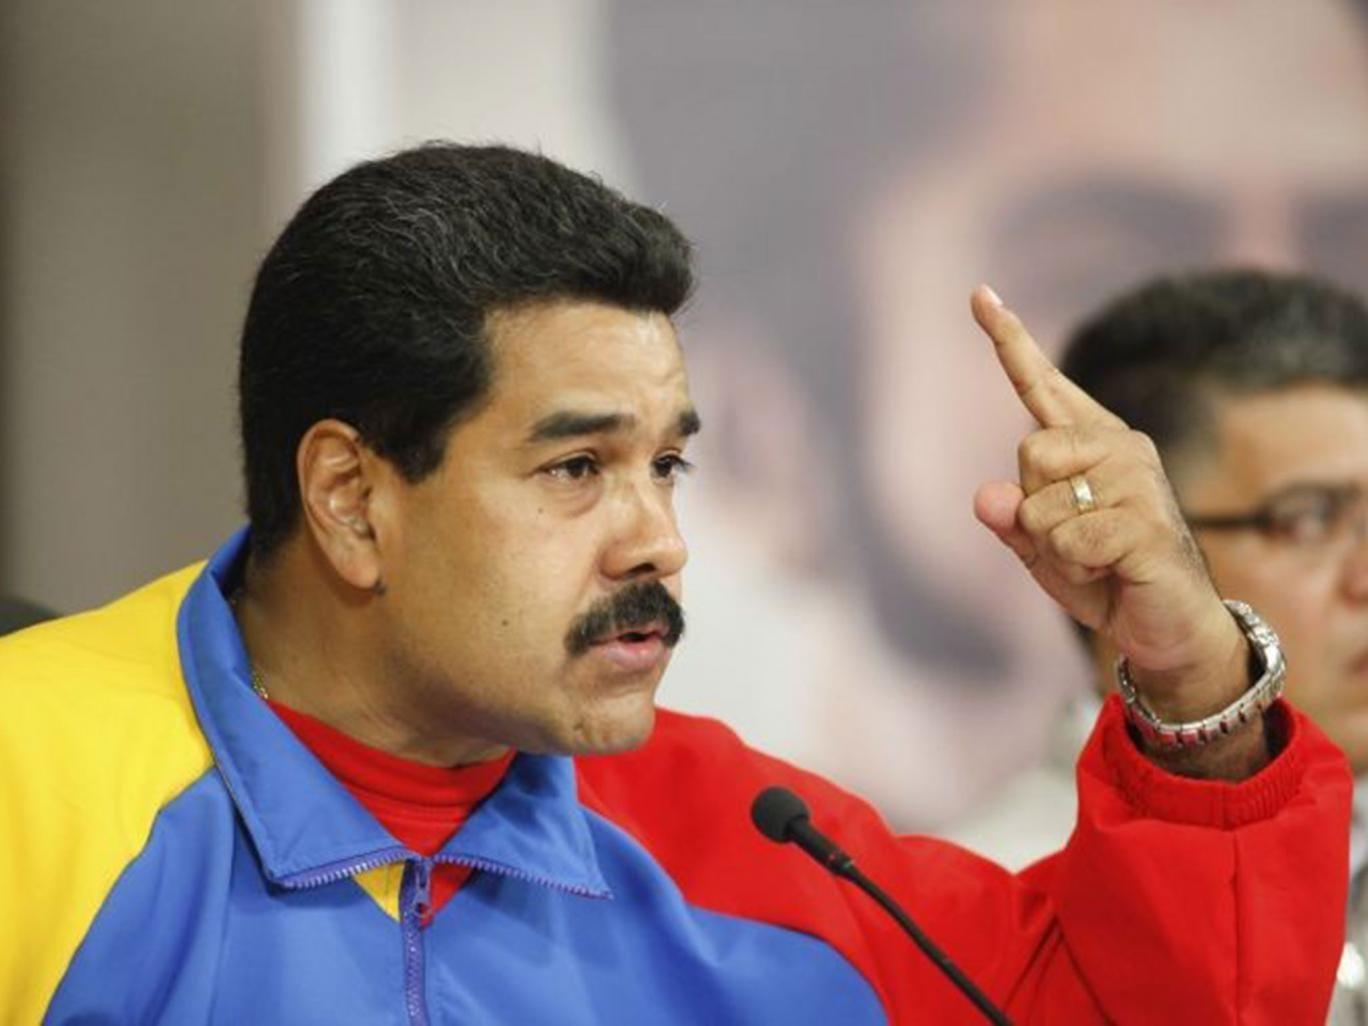 The Venezuelan president Nicolas Maduro